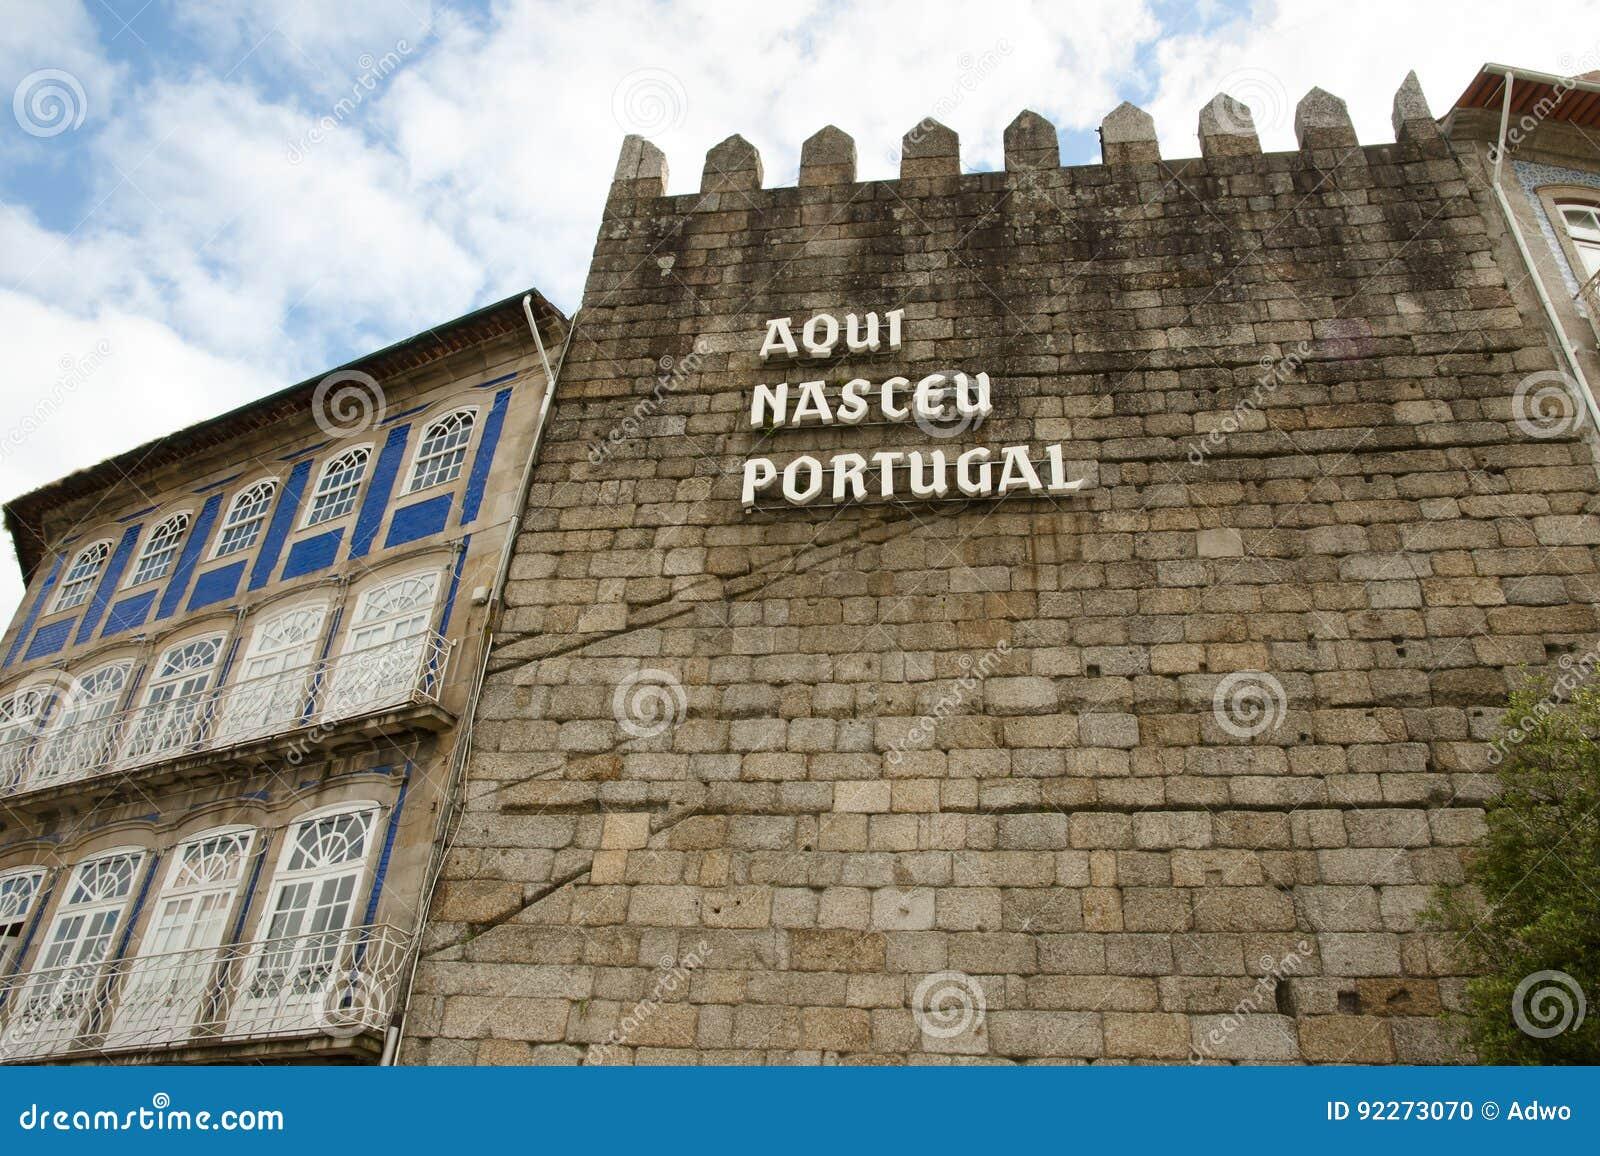 ` Aqui Nasceu葡萄牙` -吉马朗伊什-葡萄牙